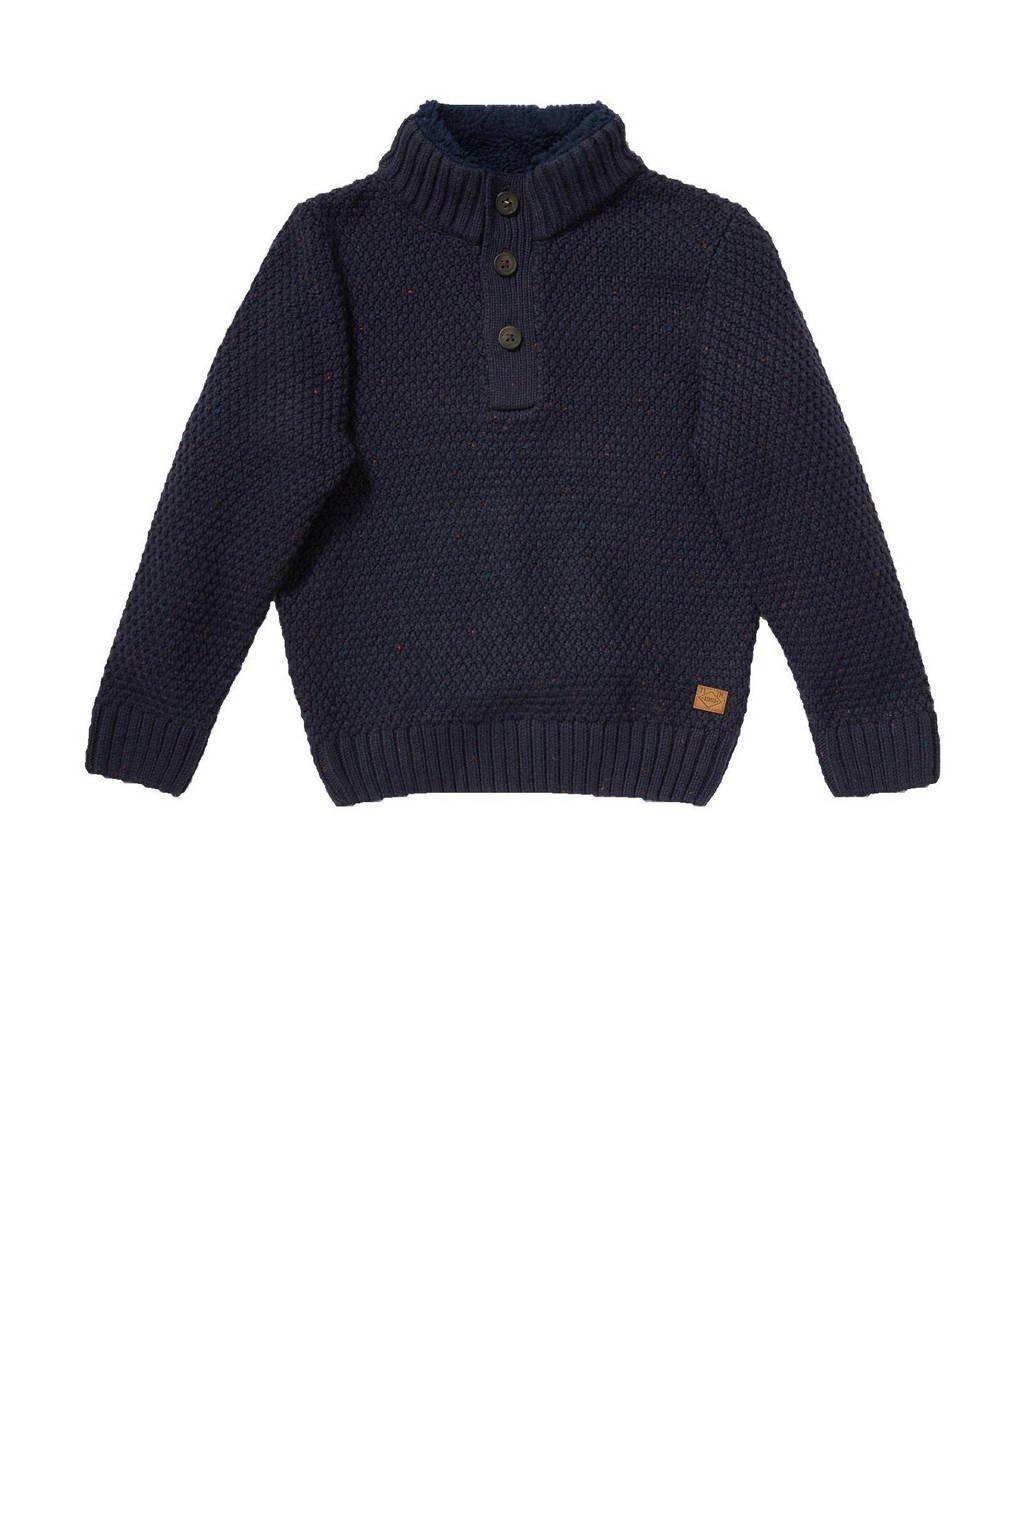 C&A gebreide trui donkerblauw, Donkerblauw